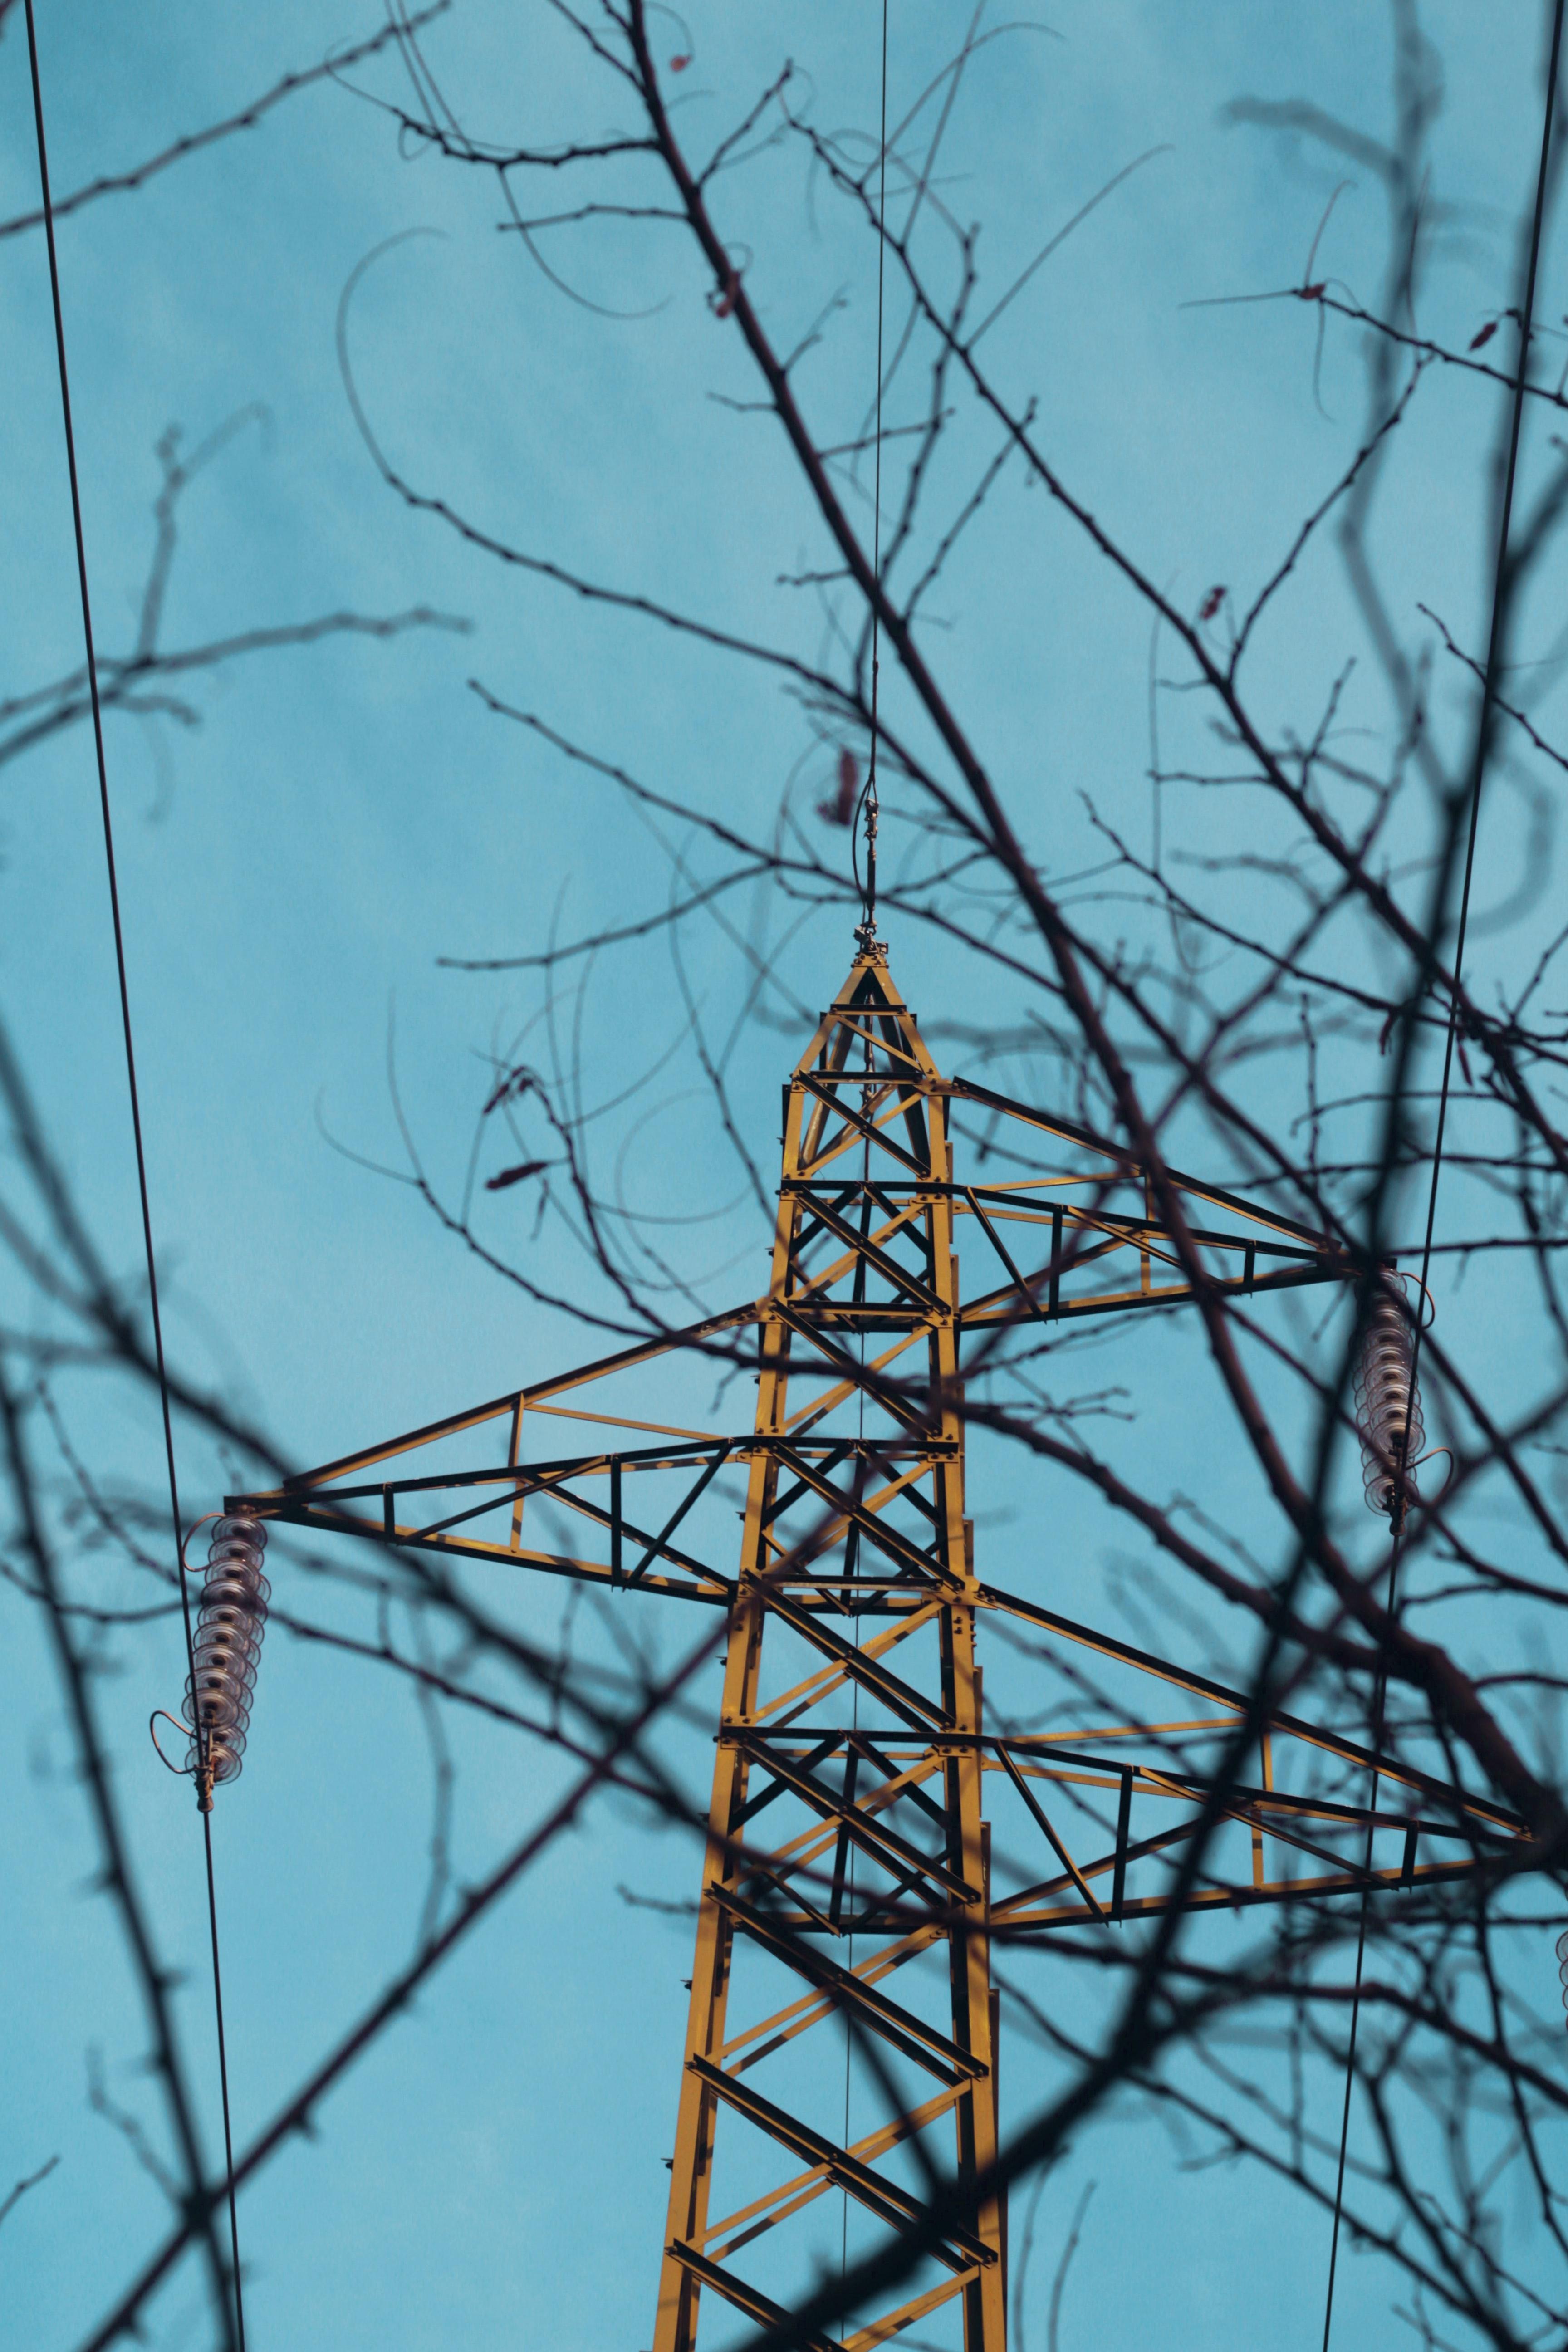 Transmission Tower Pictures Download Free Images On Unsplash